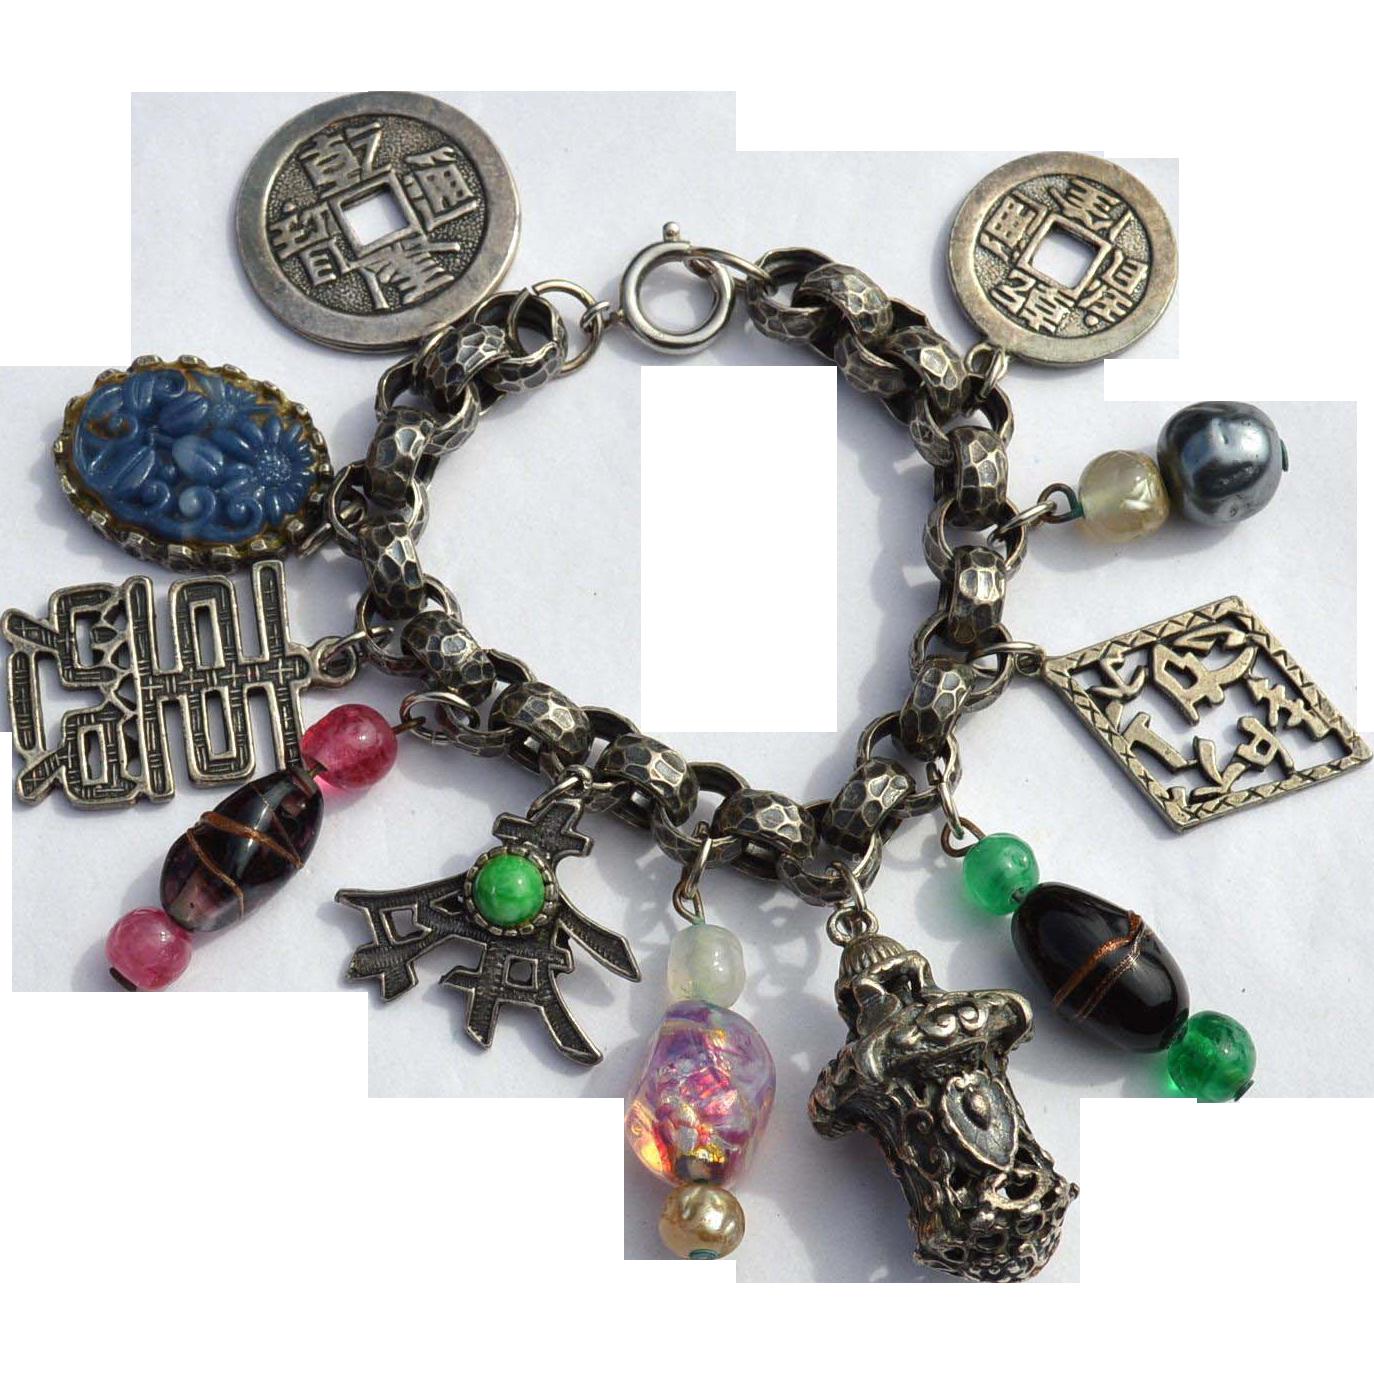 Vintage 1950's NAPIER Asian Theme Charm Bracelet, Glass, Very Ornate